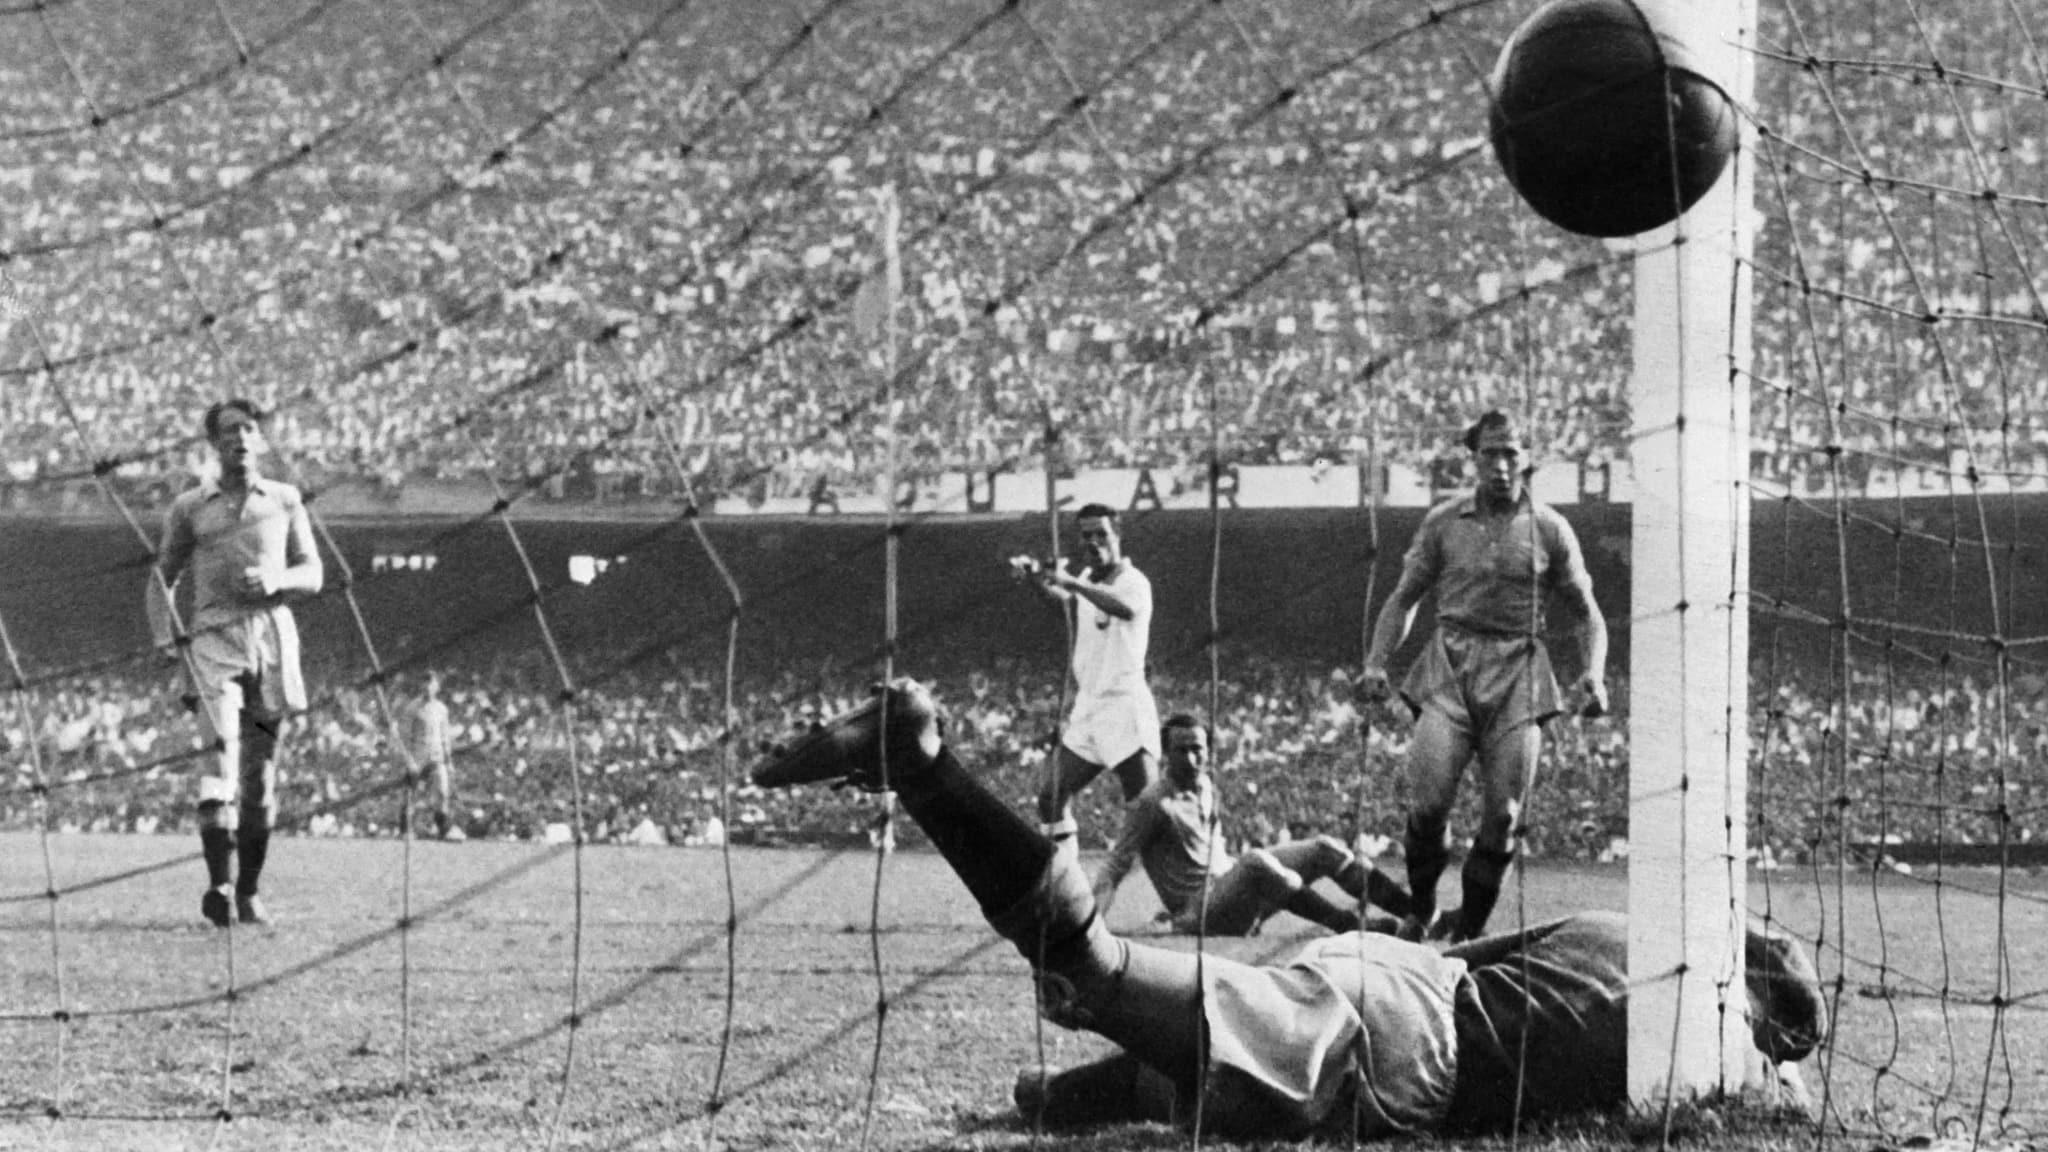 brazil 1950 world cup